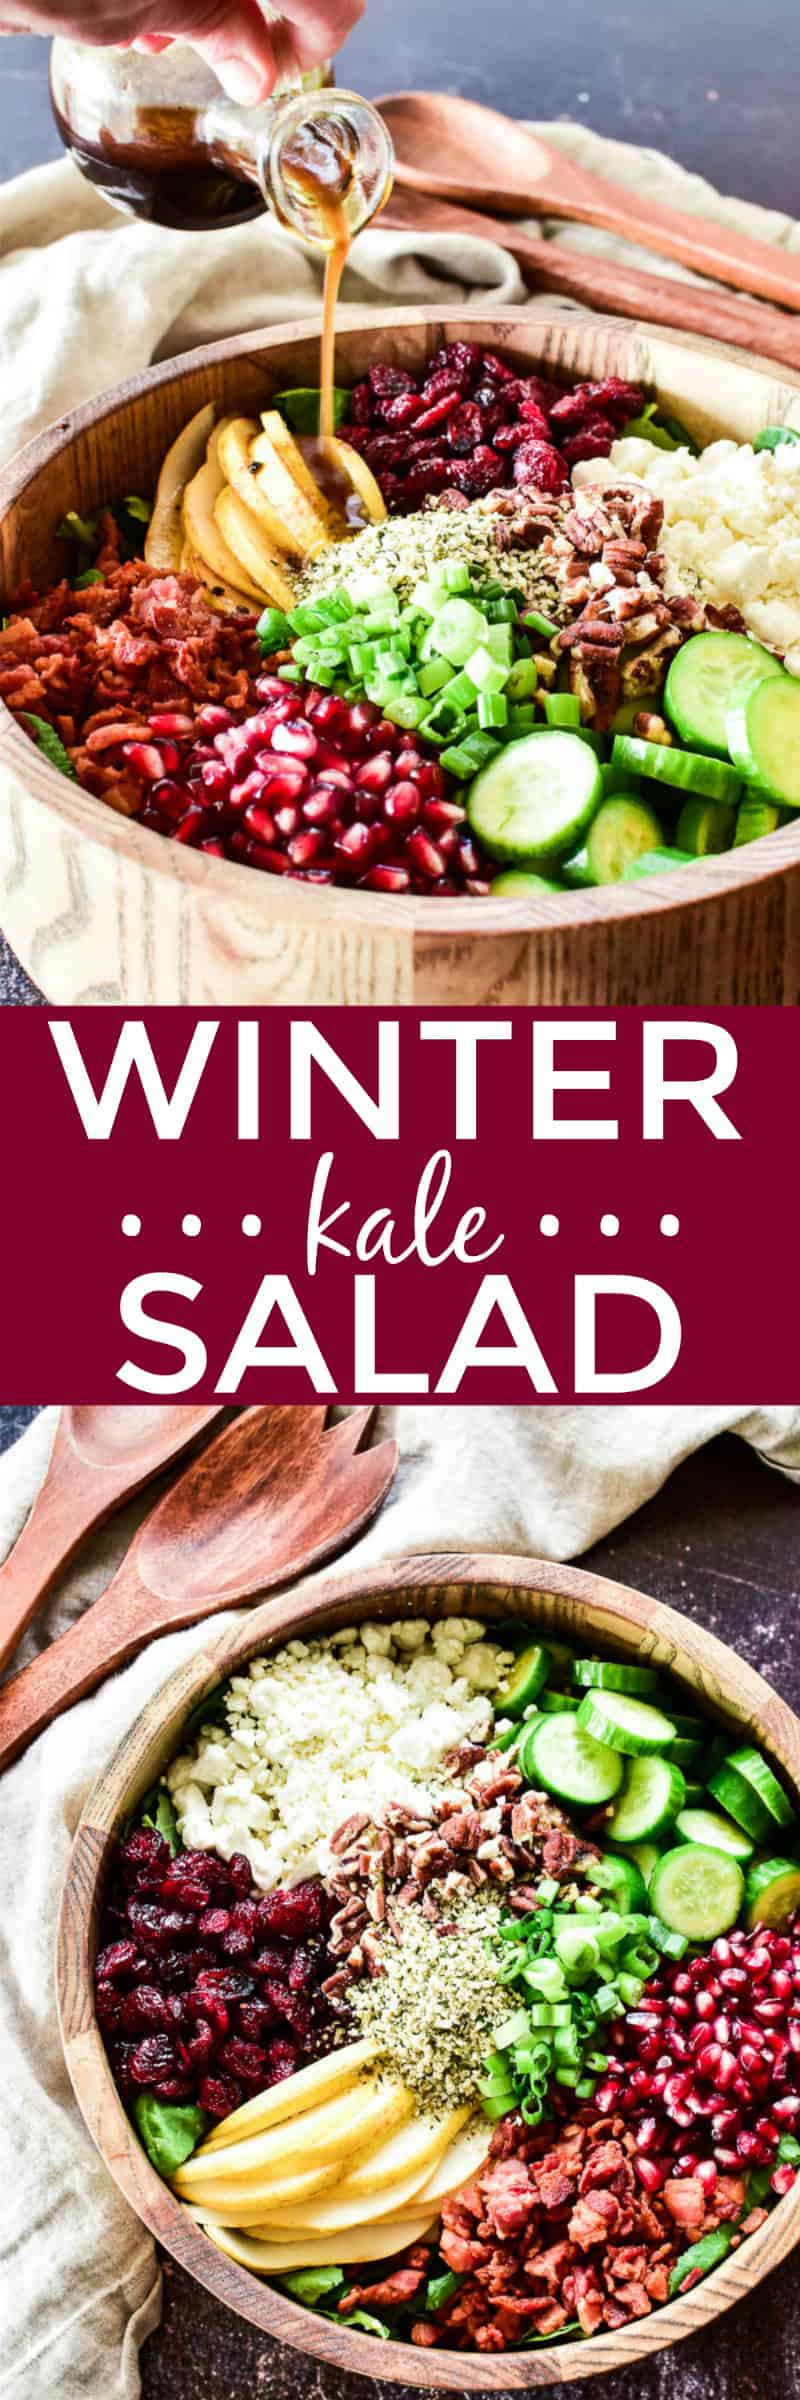 Collage image of Winter Kale Salad